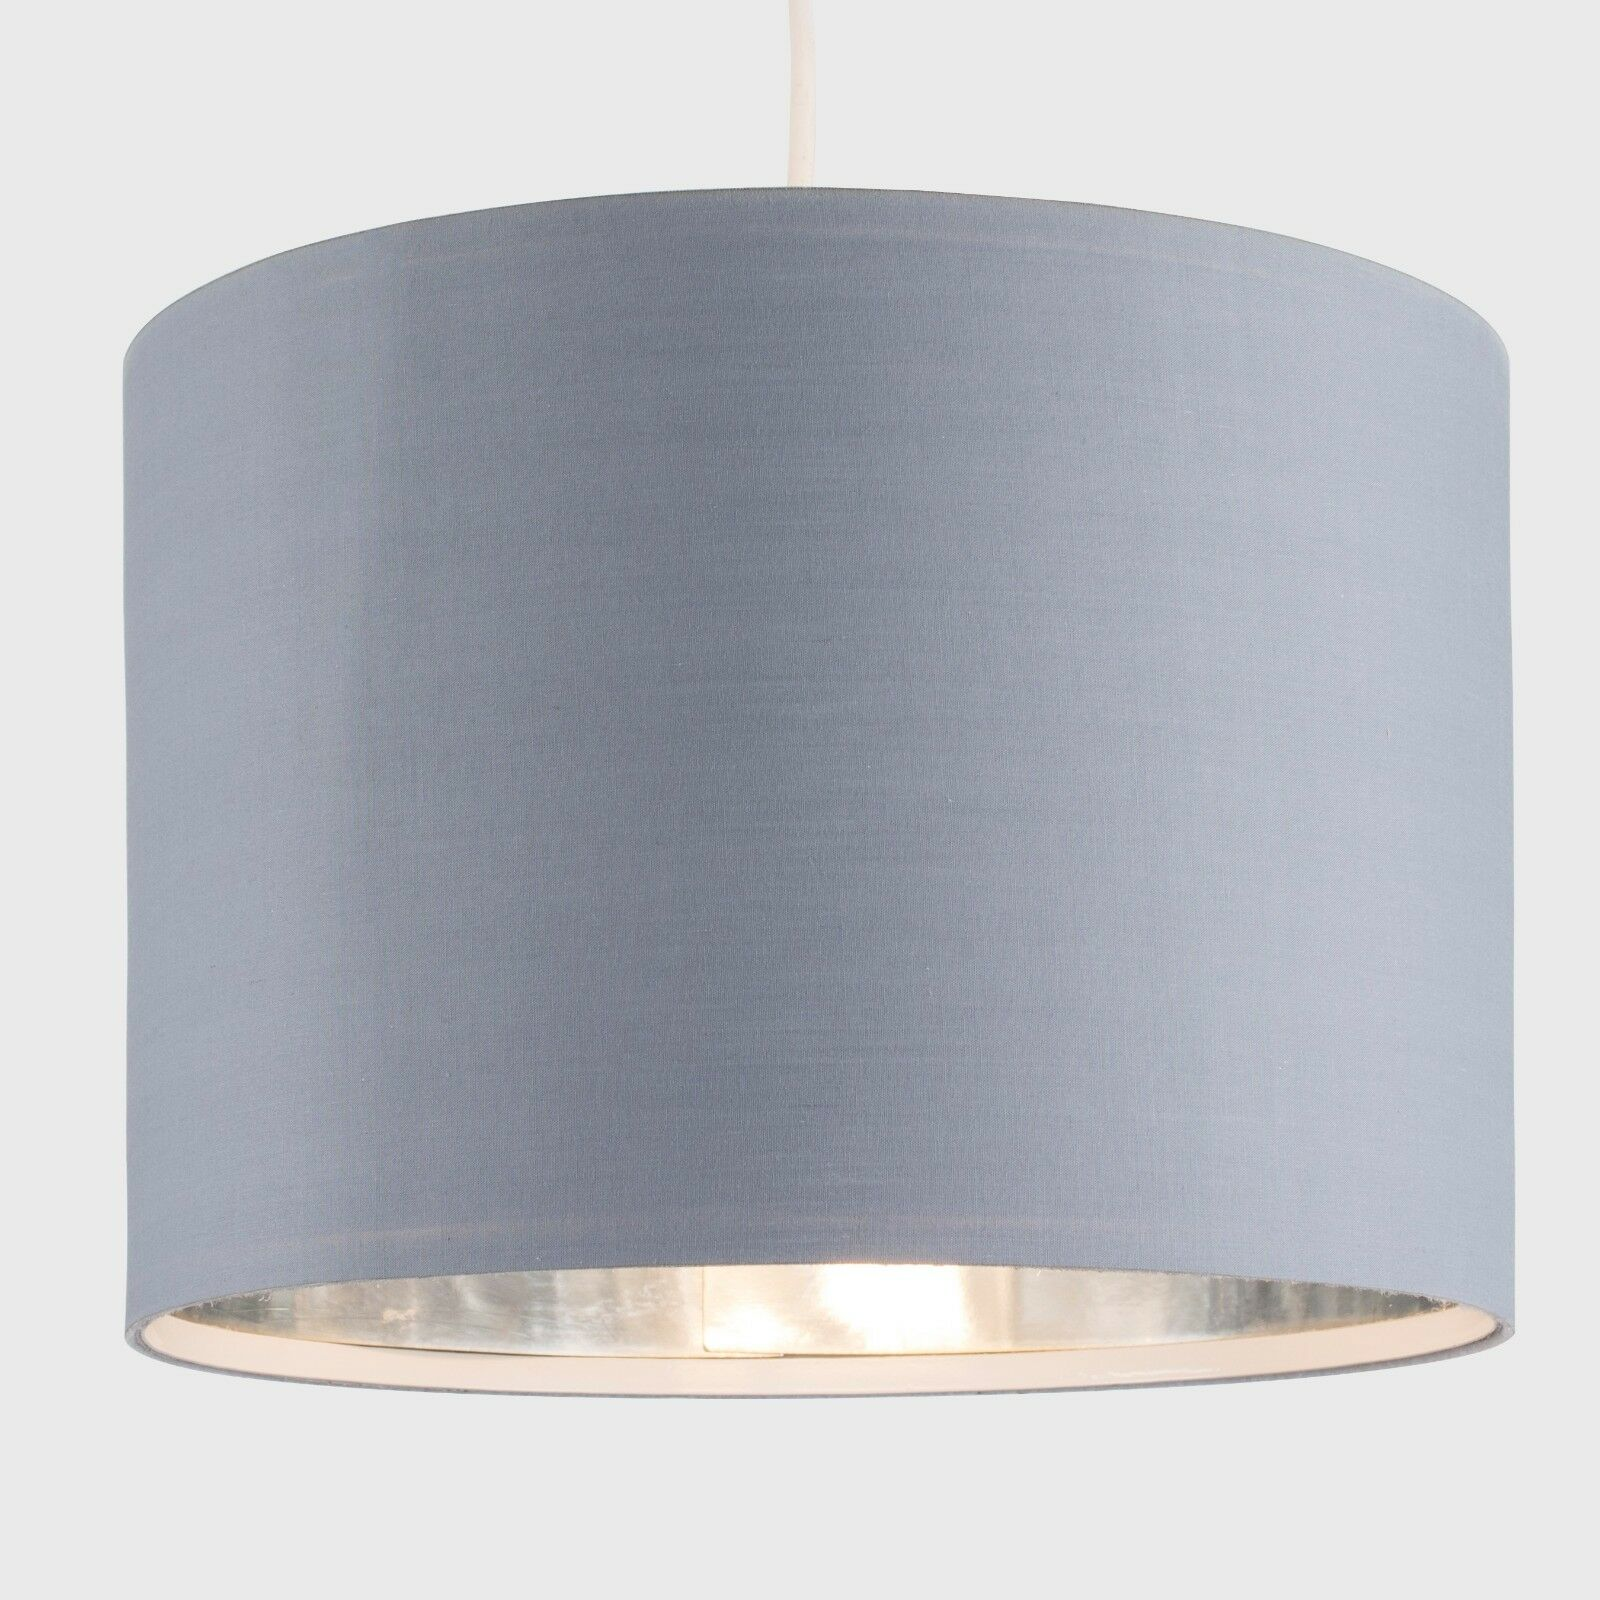 Tela-moderna-algodon-facil-ajuste-Techo-Colgante-Pantalla-De-Mesa-tonos-de-luz-de-tambor miniatura 122